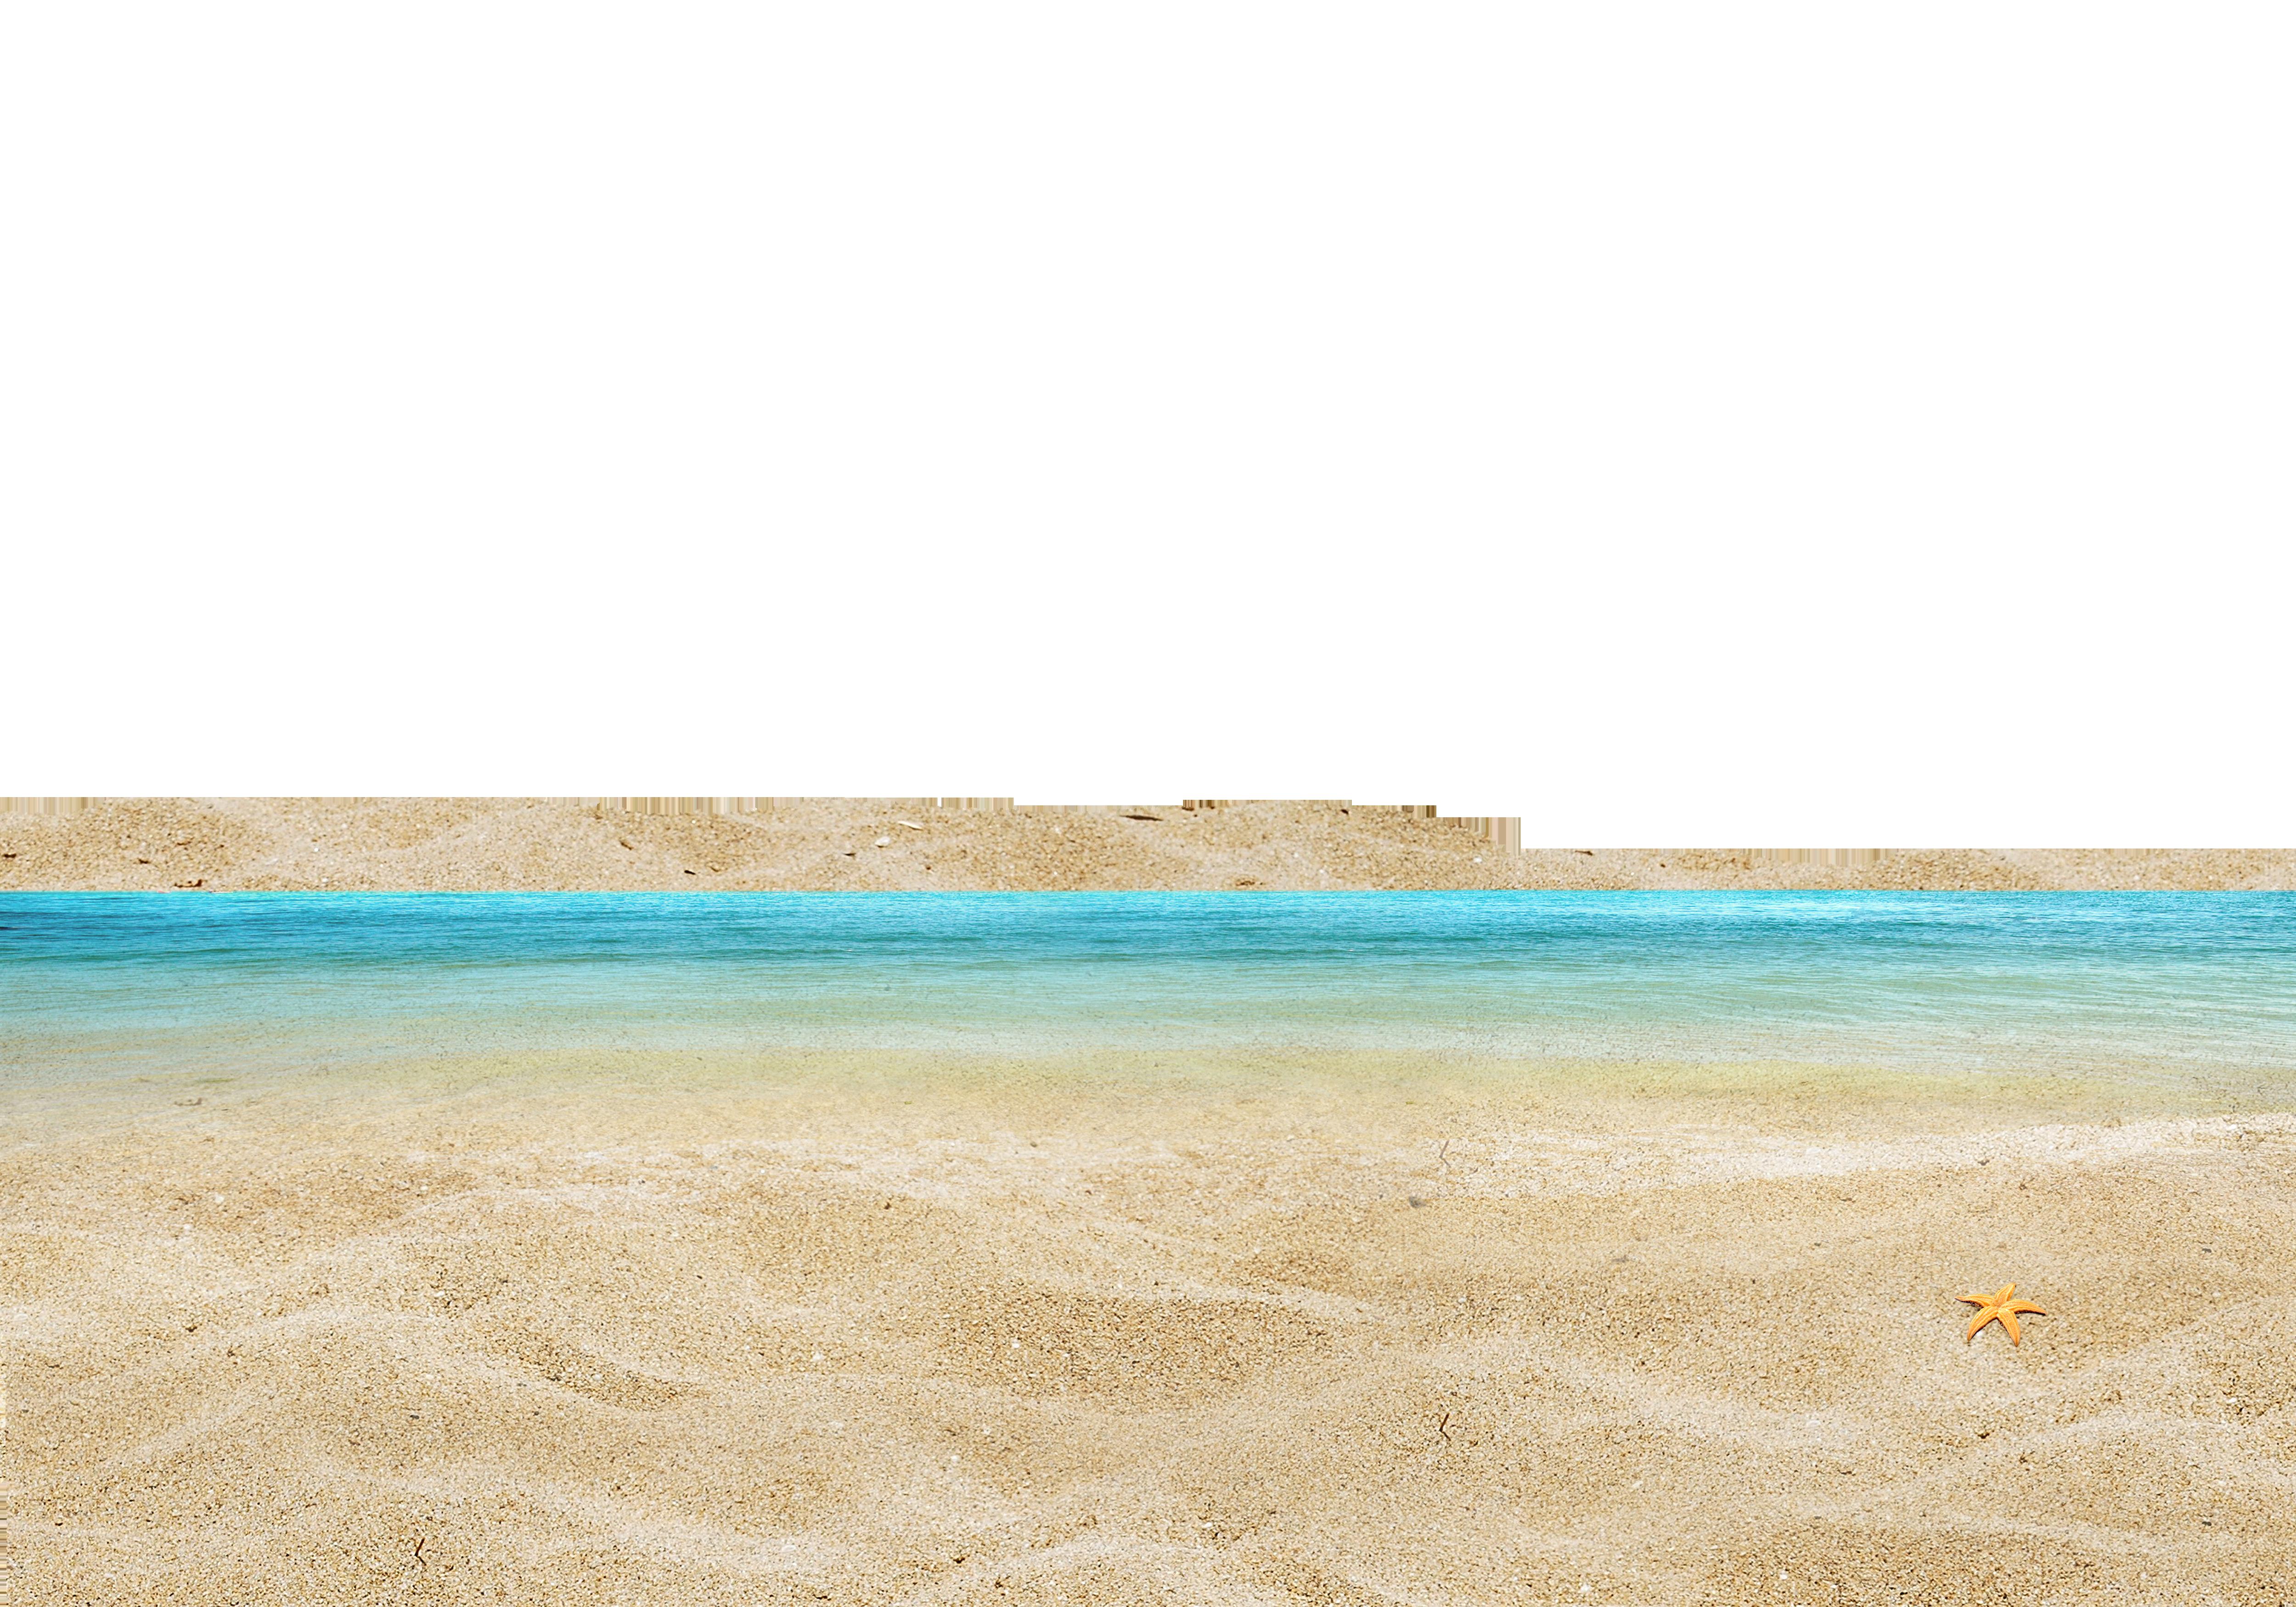 Sea with Star Fish at the Shore PNG Image.